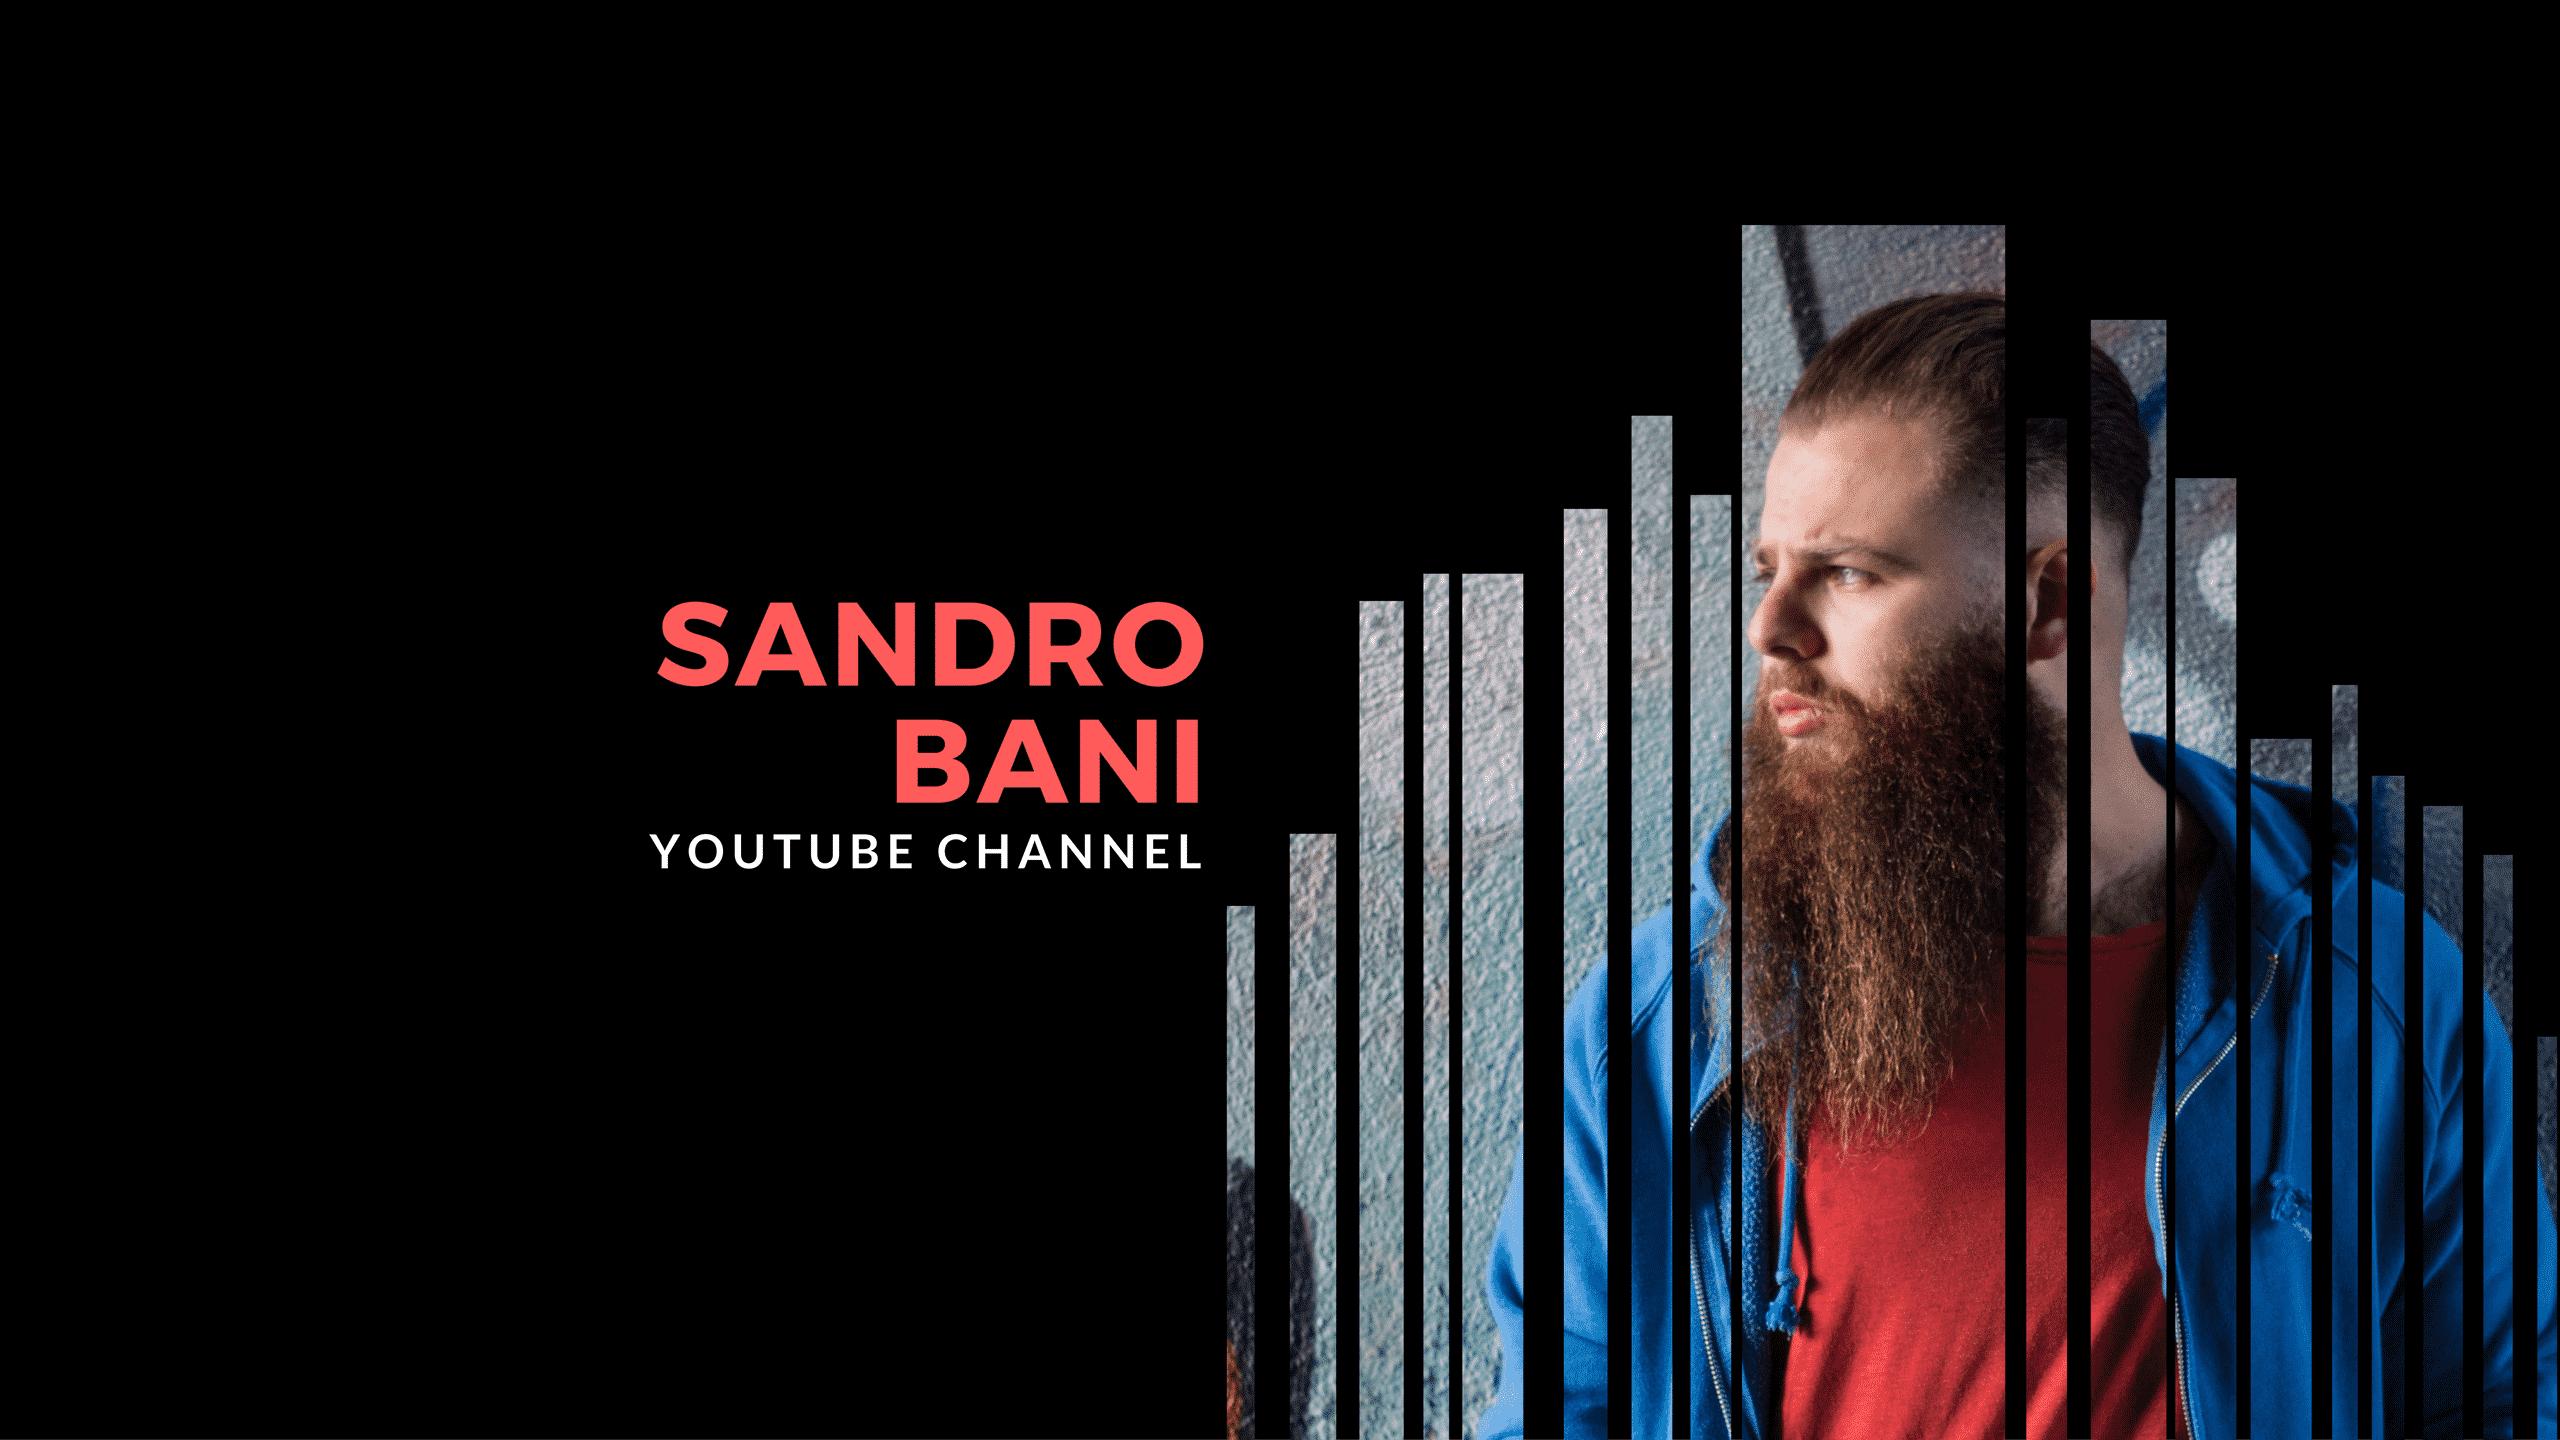 Sandro Bani YouTube Channel